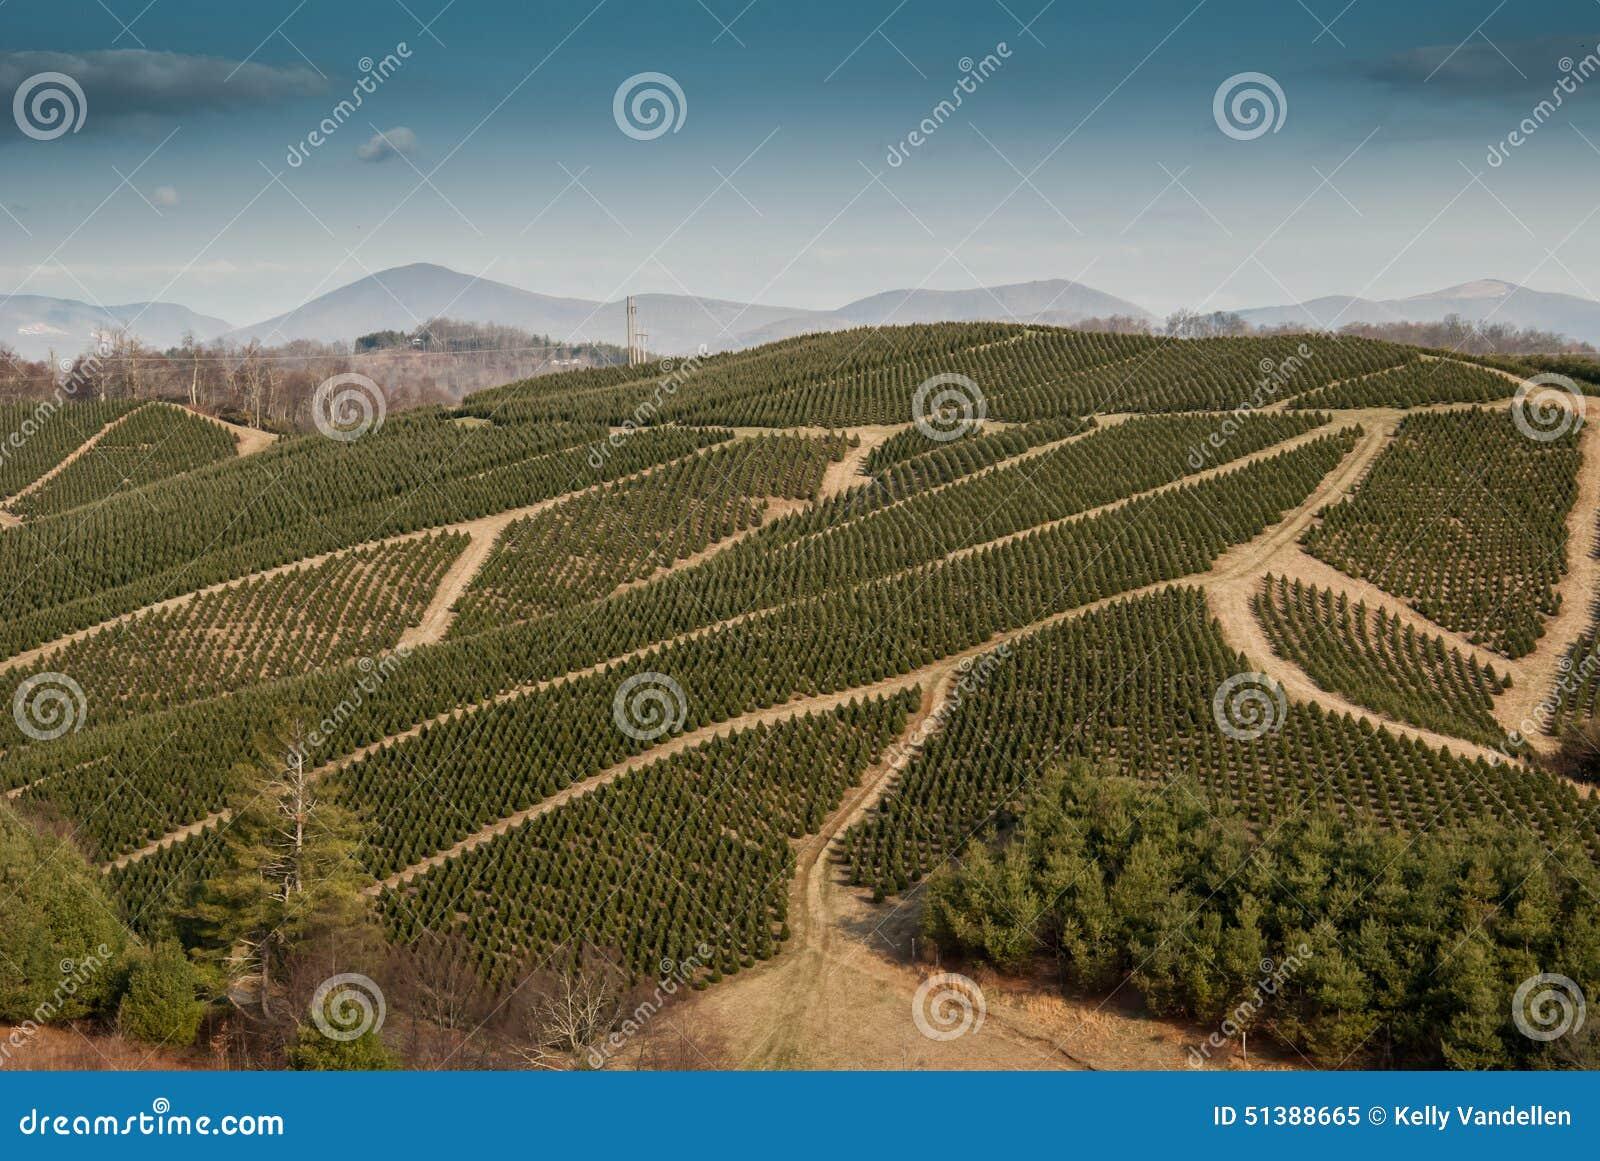 Christmas Tree Farm In Western North Carolina Stock Photo ...